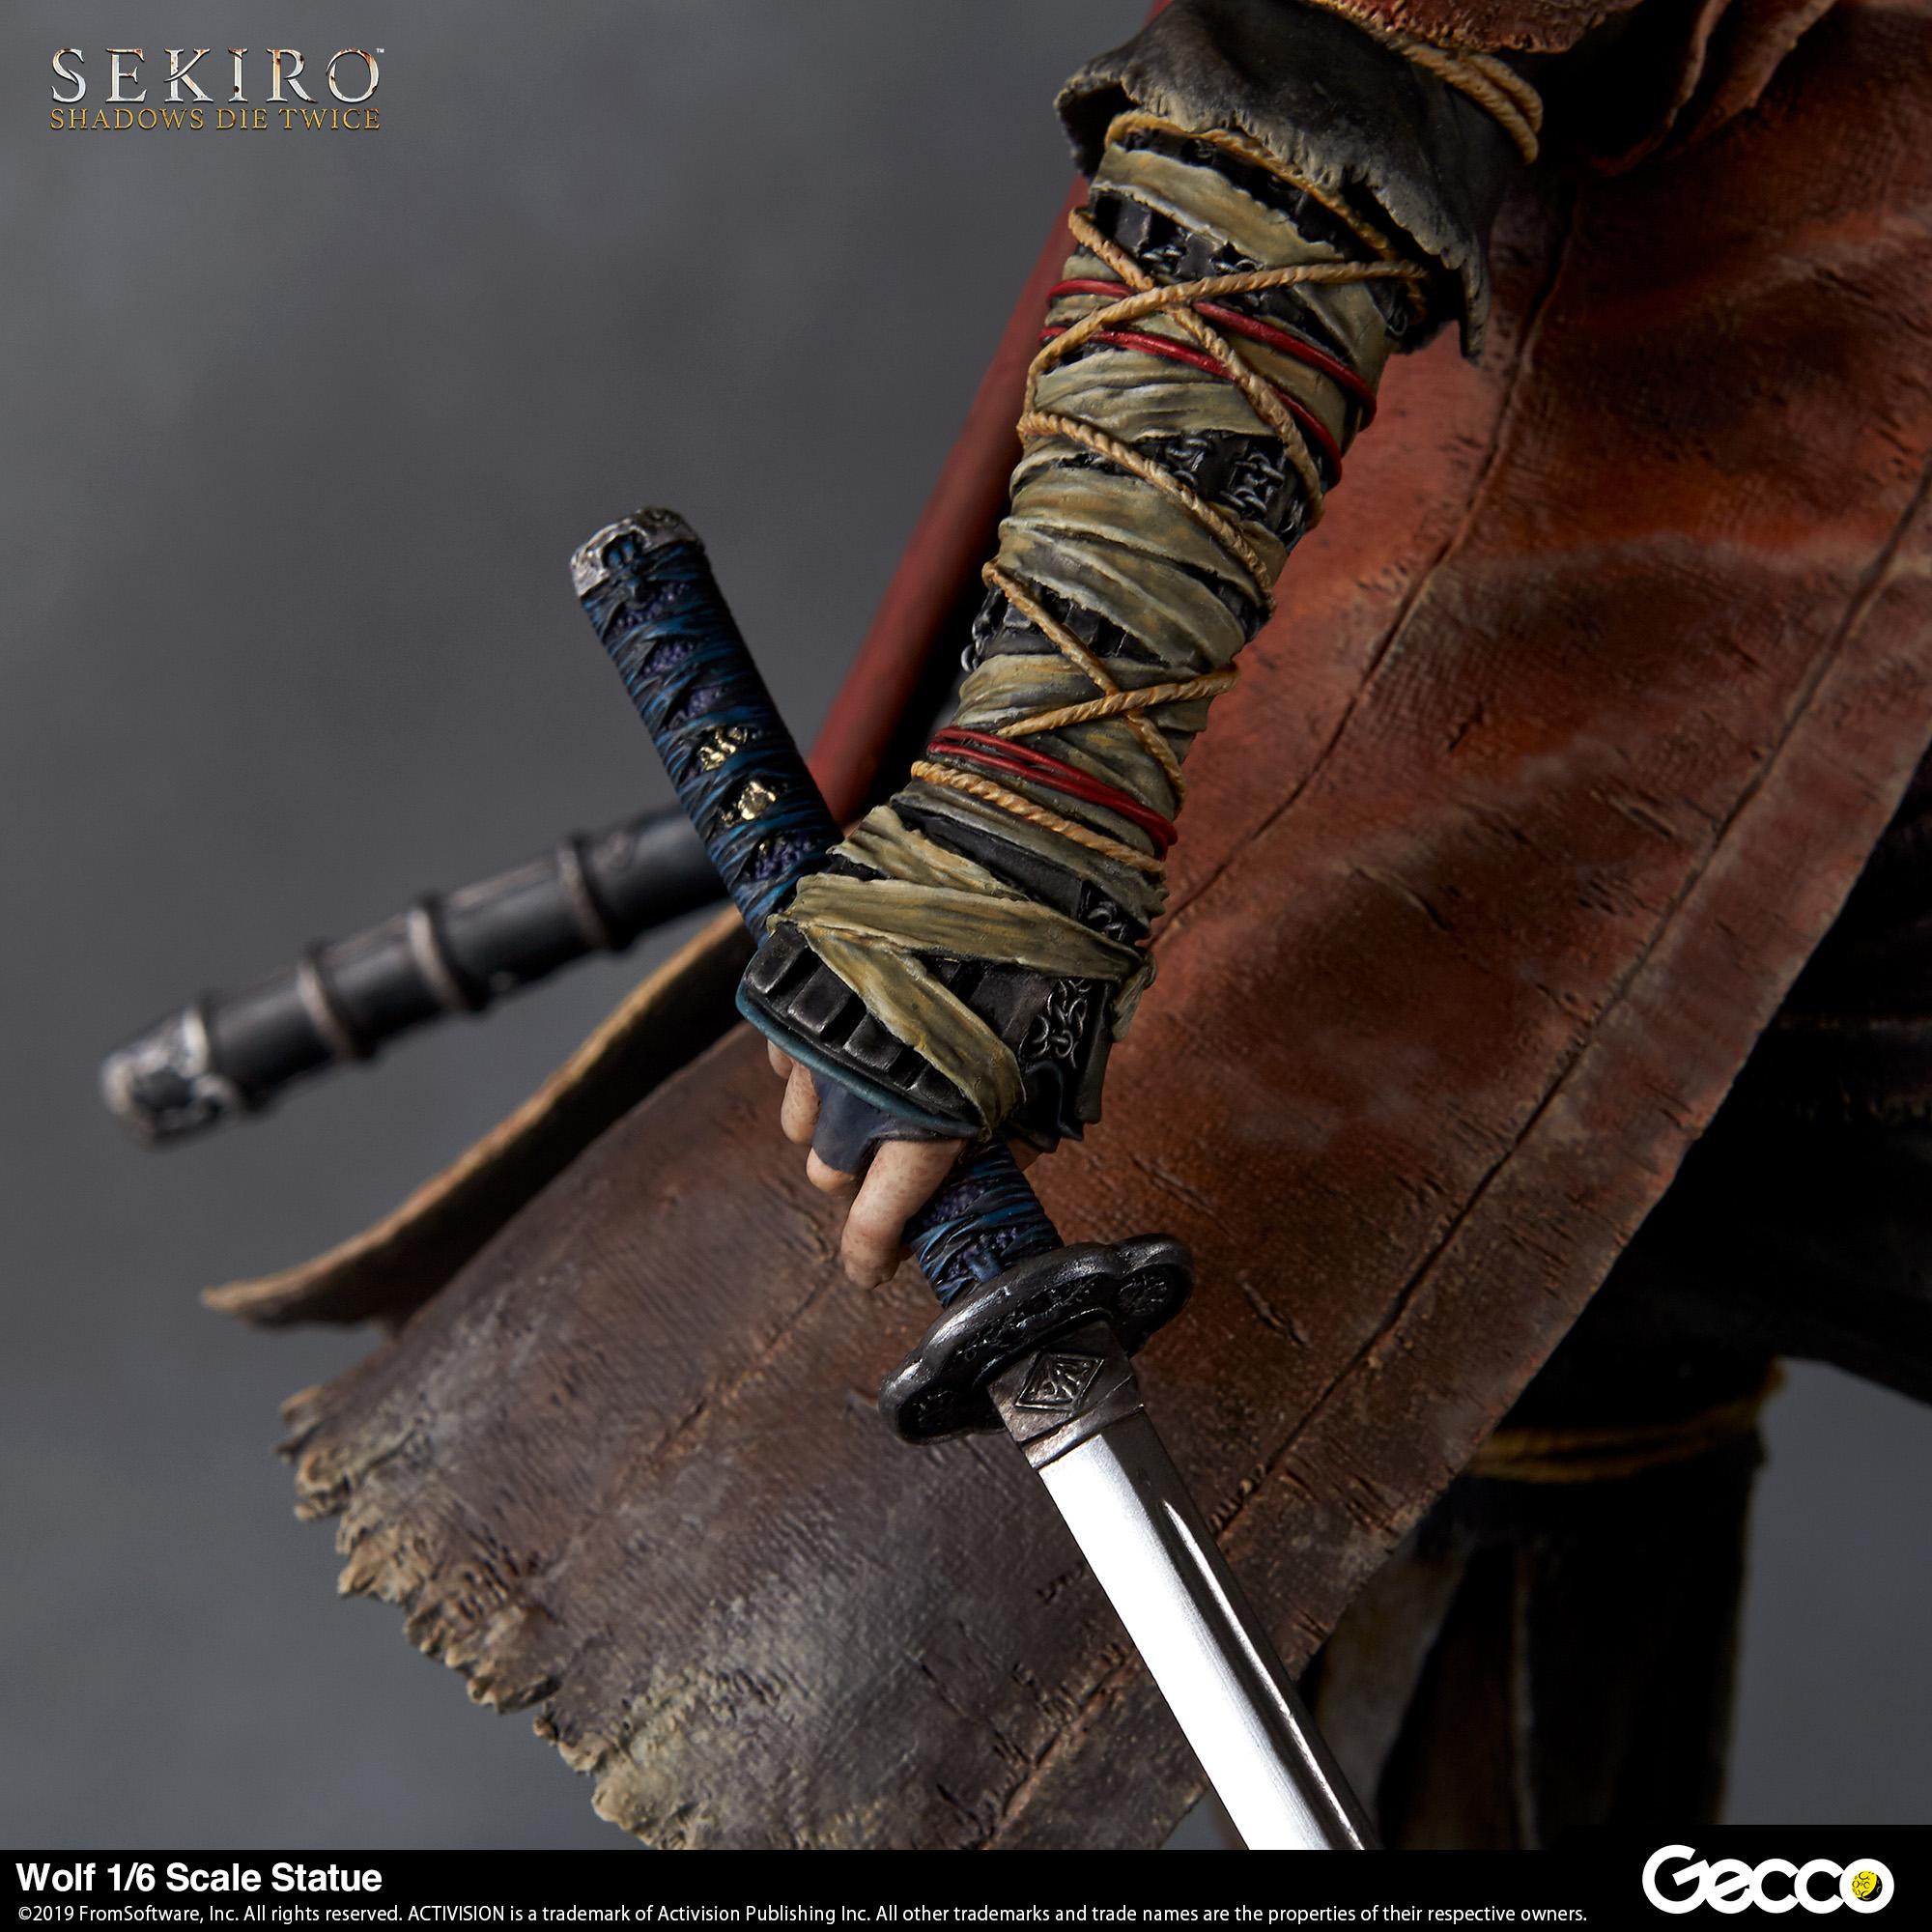 Link a Sekiro_Shadows_die_Twice_Wolf_Okami_Lupo_Statue_Figure_Gecco-1 (21)